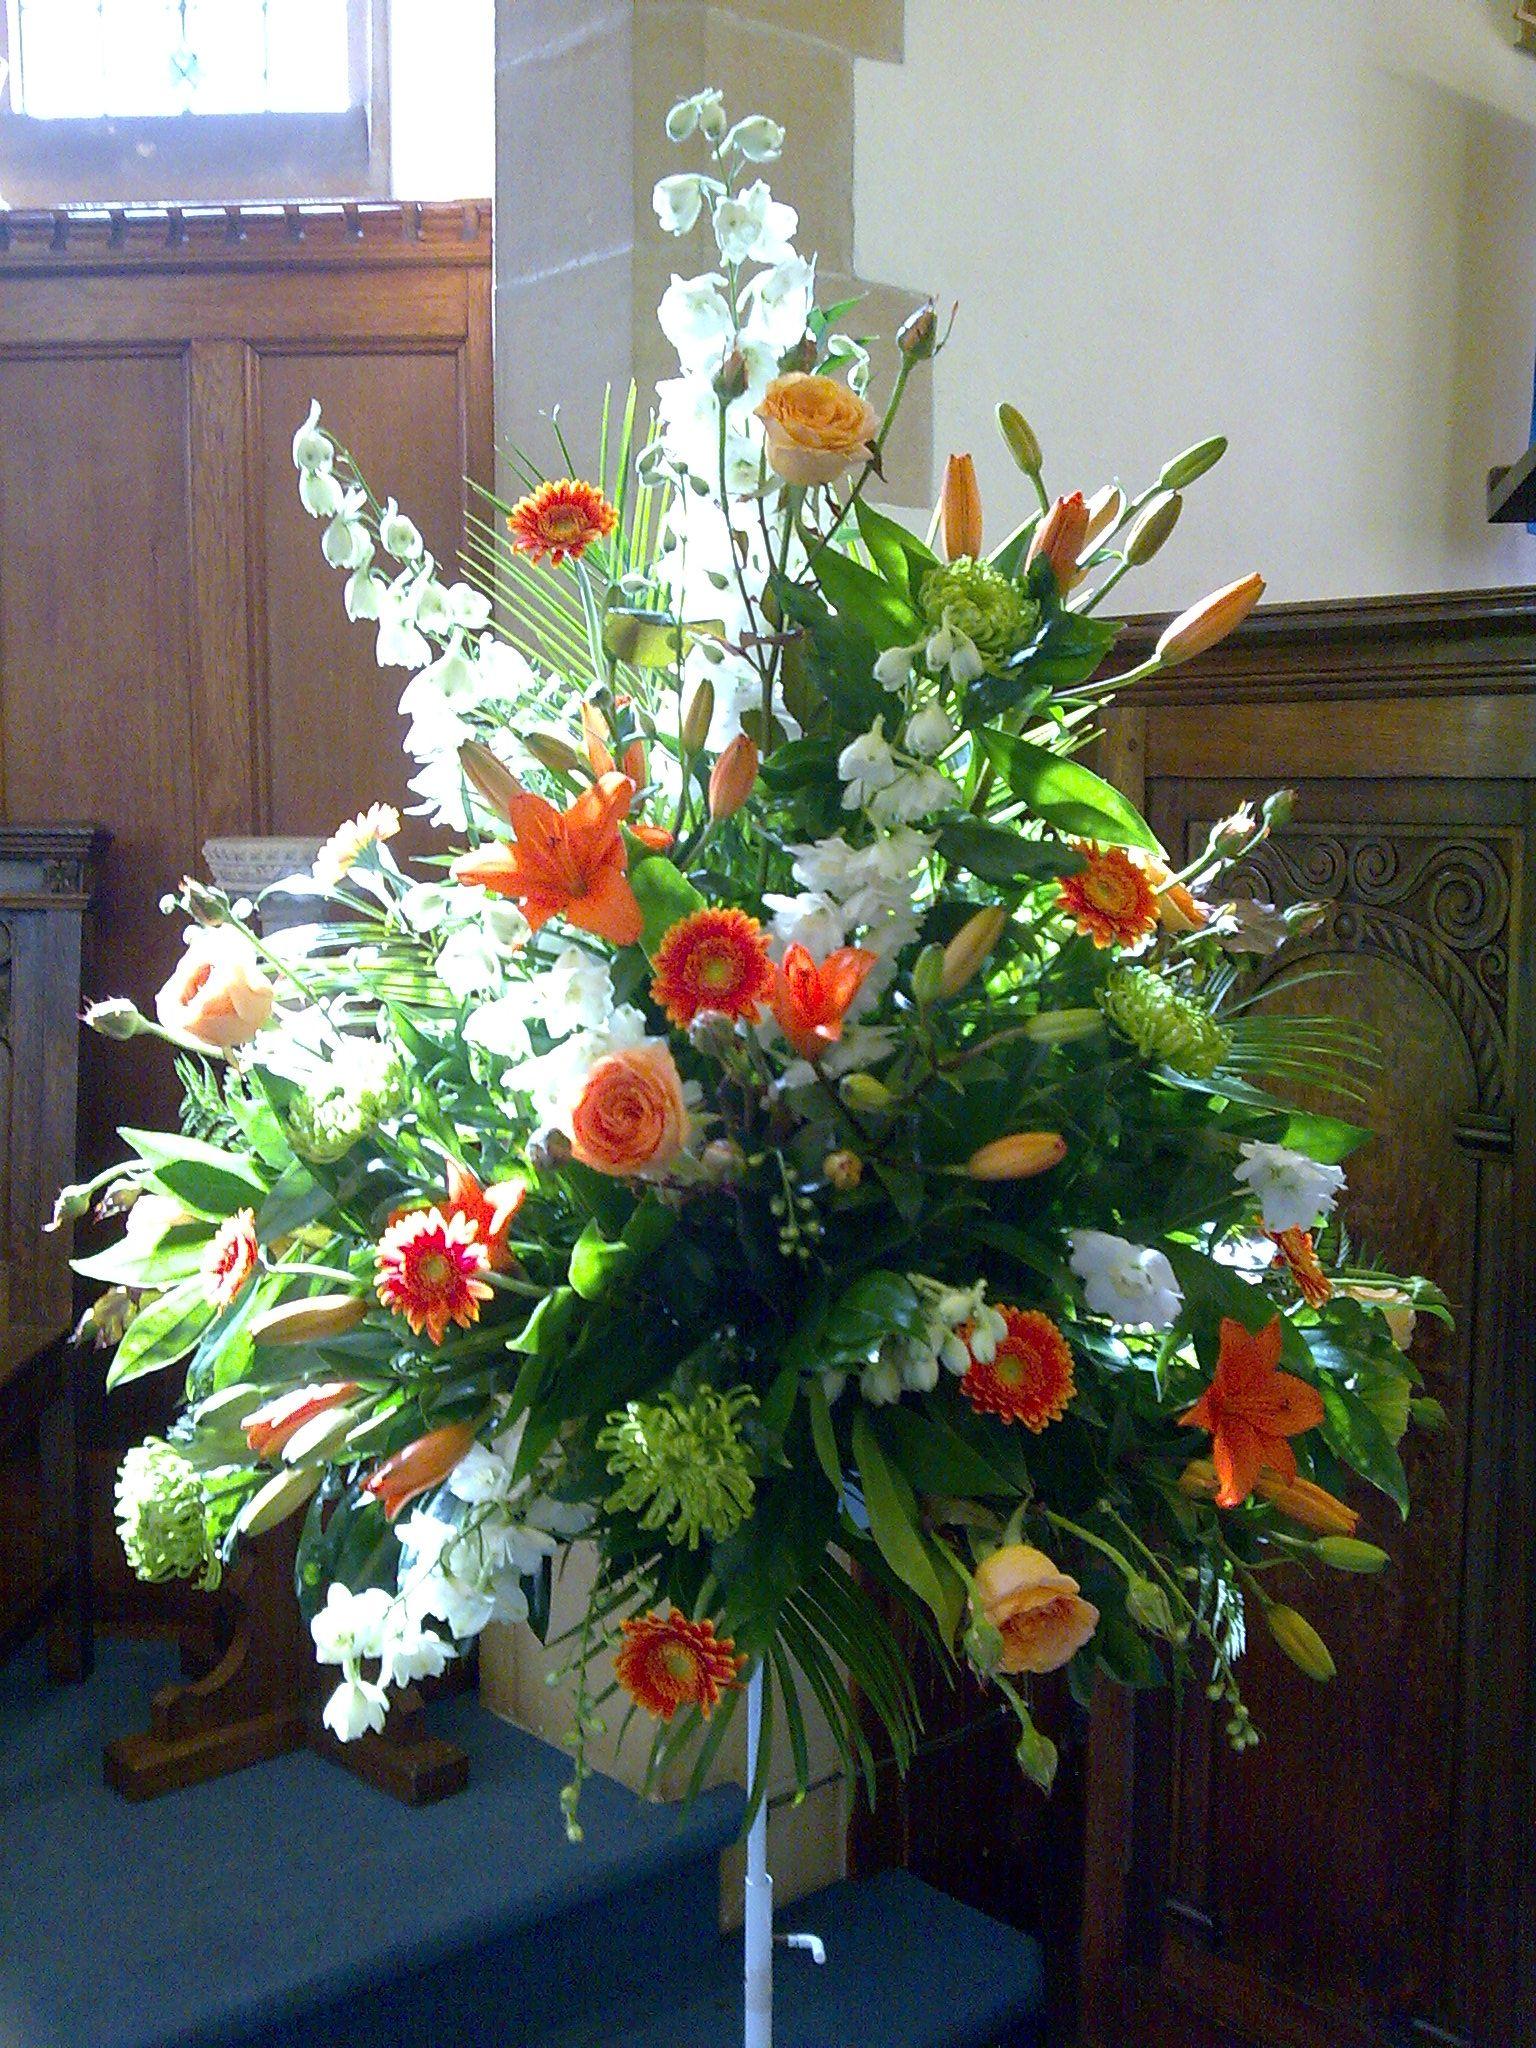 traditonal pedestal arrangement wedding flowers flower arrangements flowers funeral floral. Black Bedroom Furniture Sets. Home Design Ideas